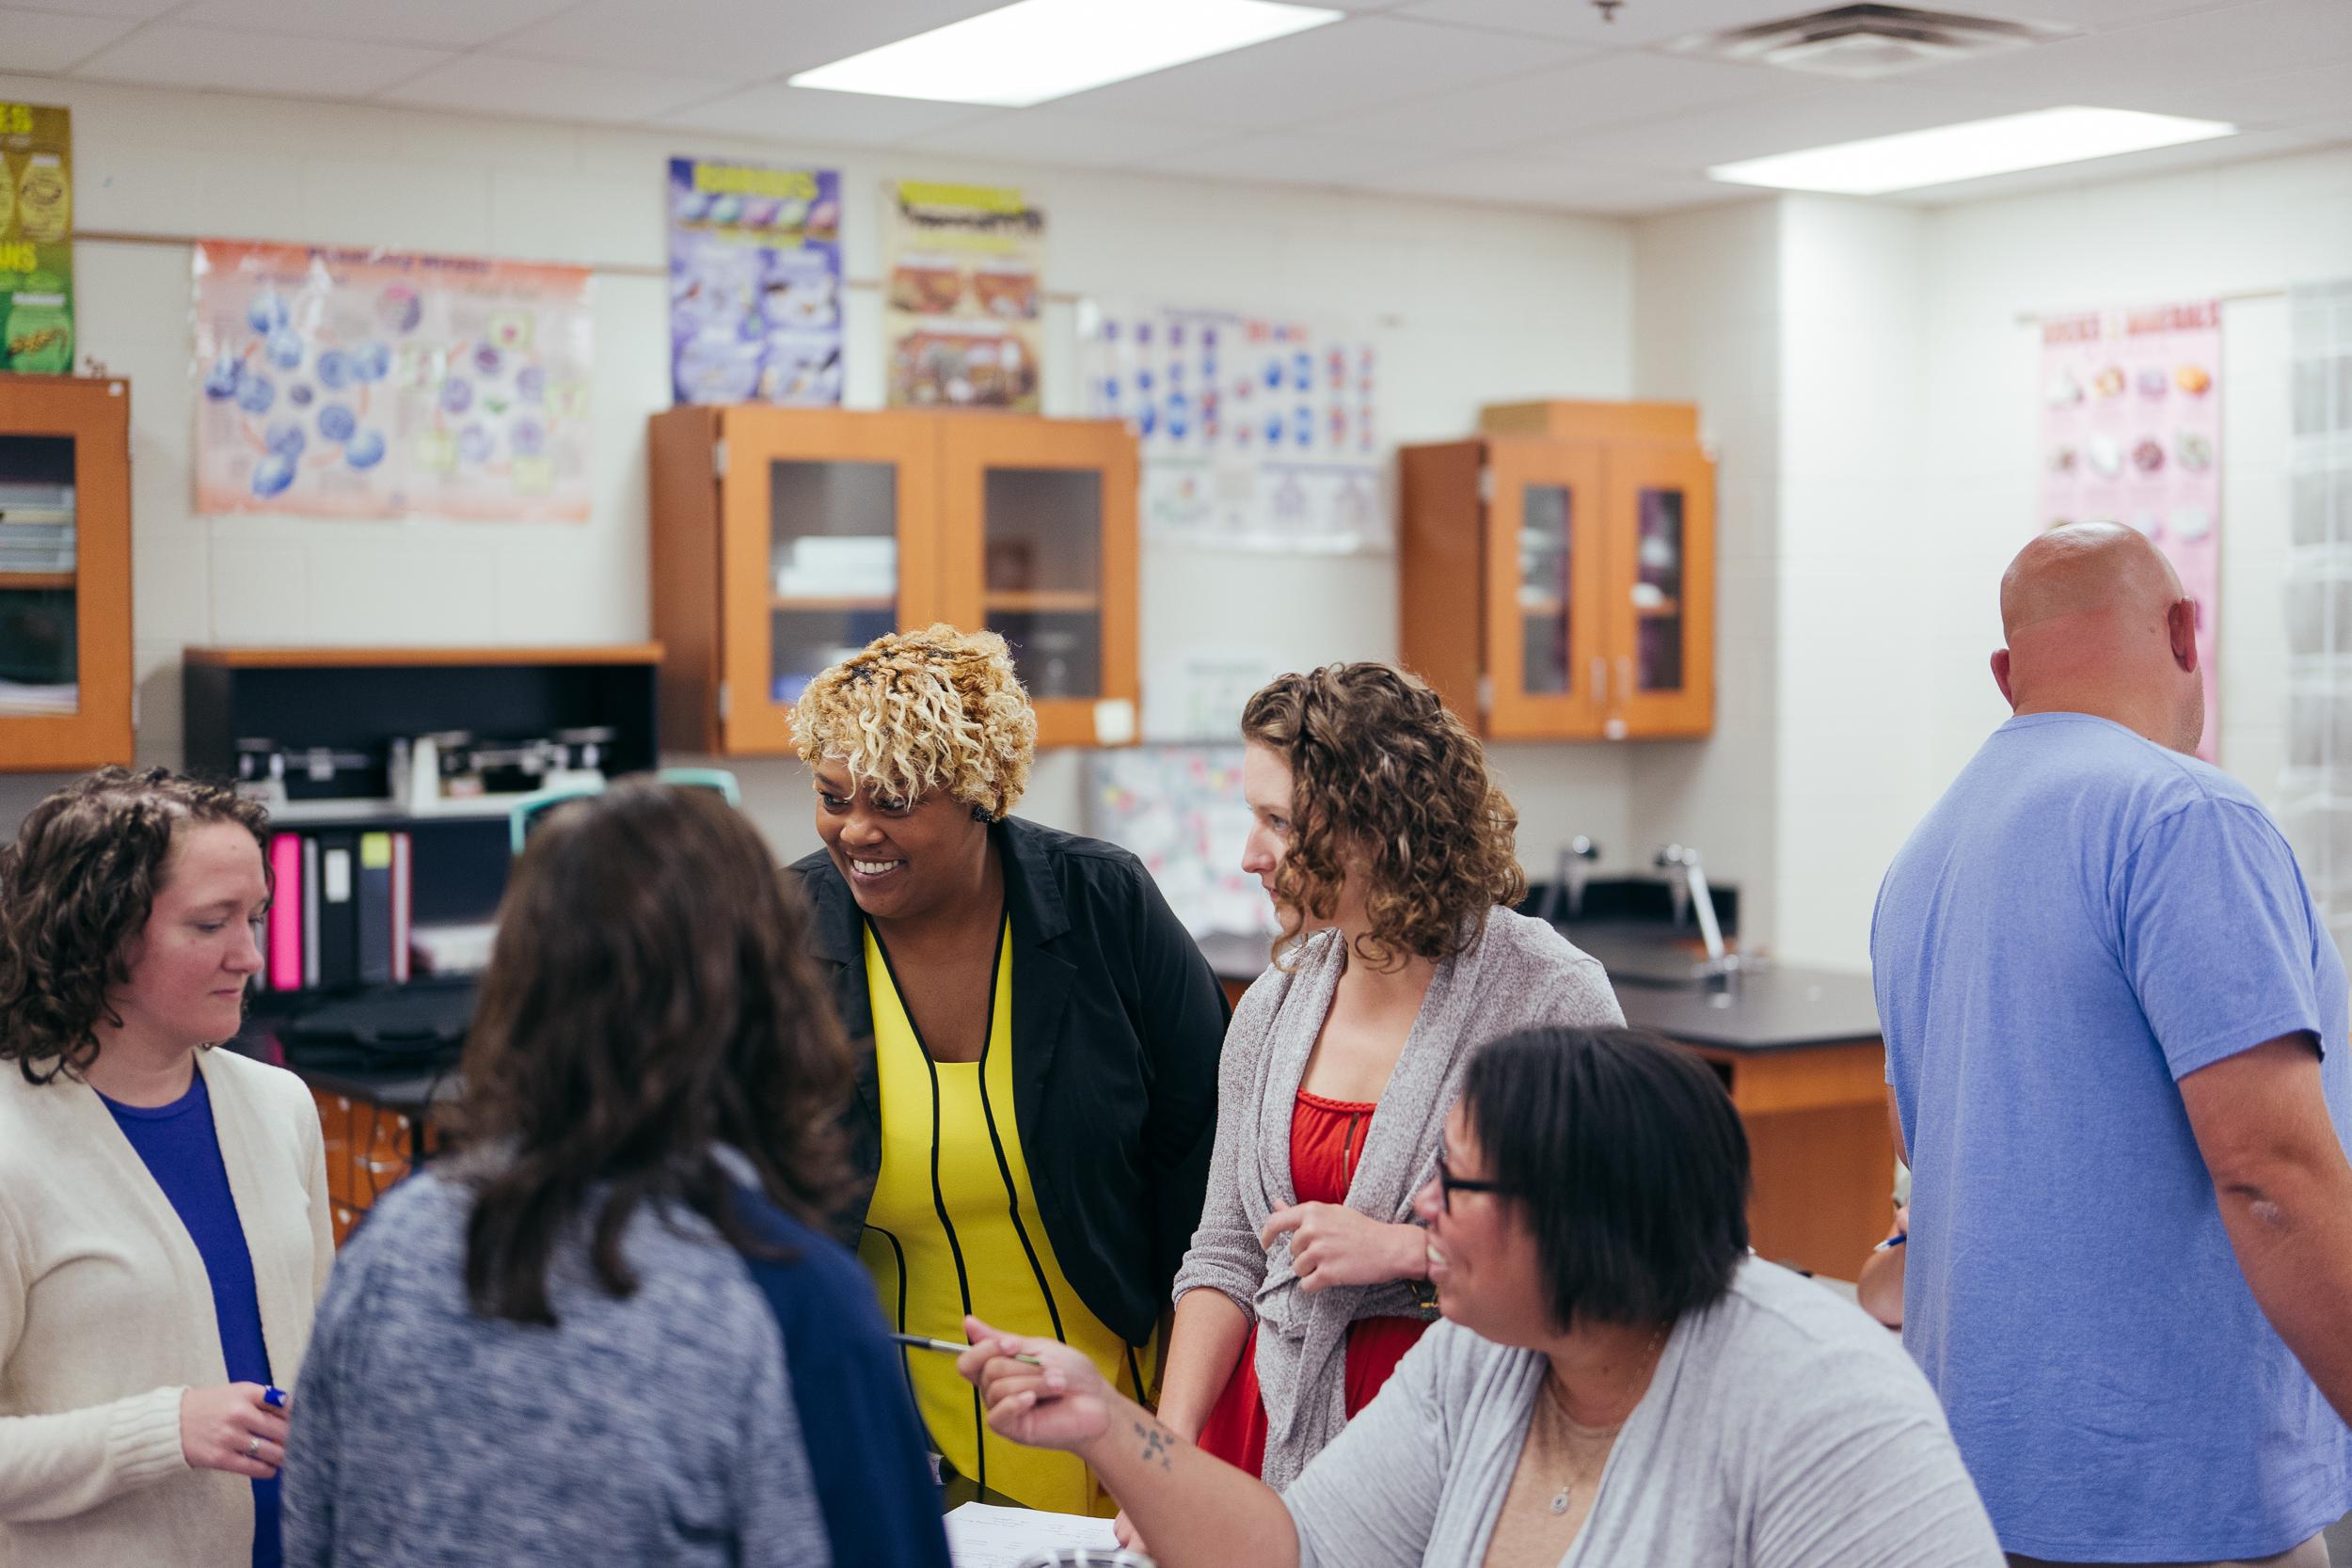 joyful teacher education photography emerging districts ©2019abigailbobophotography-33.jpg